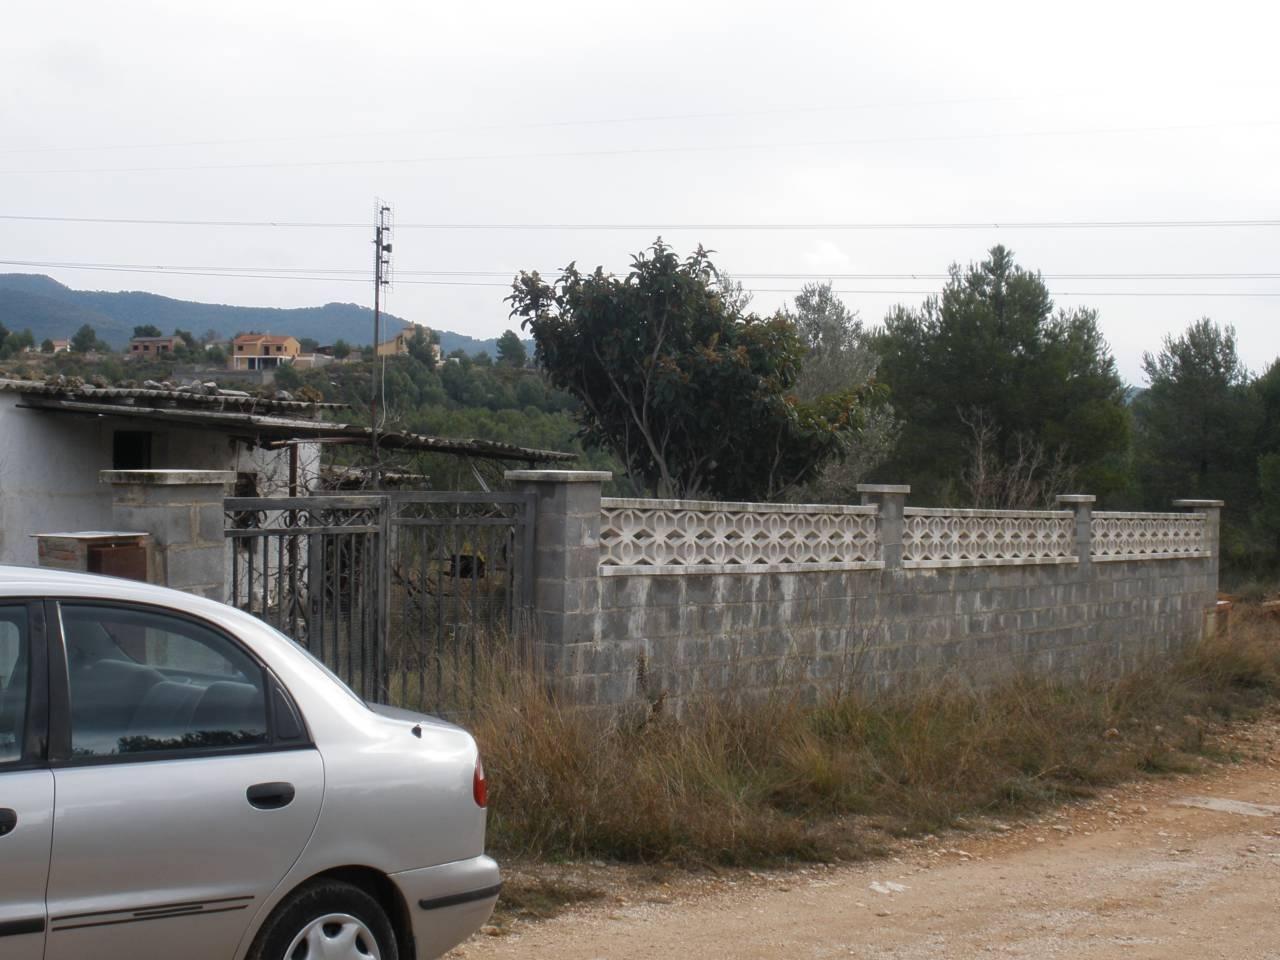 Solar urbano  Calle albacete. Terreno en venta en aiguamurcia, solar de 892 m2, edificable, ca